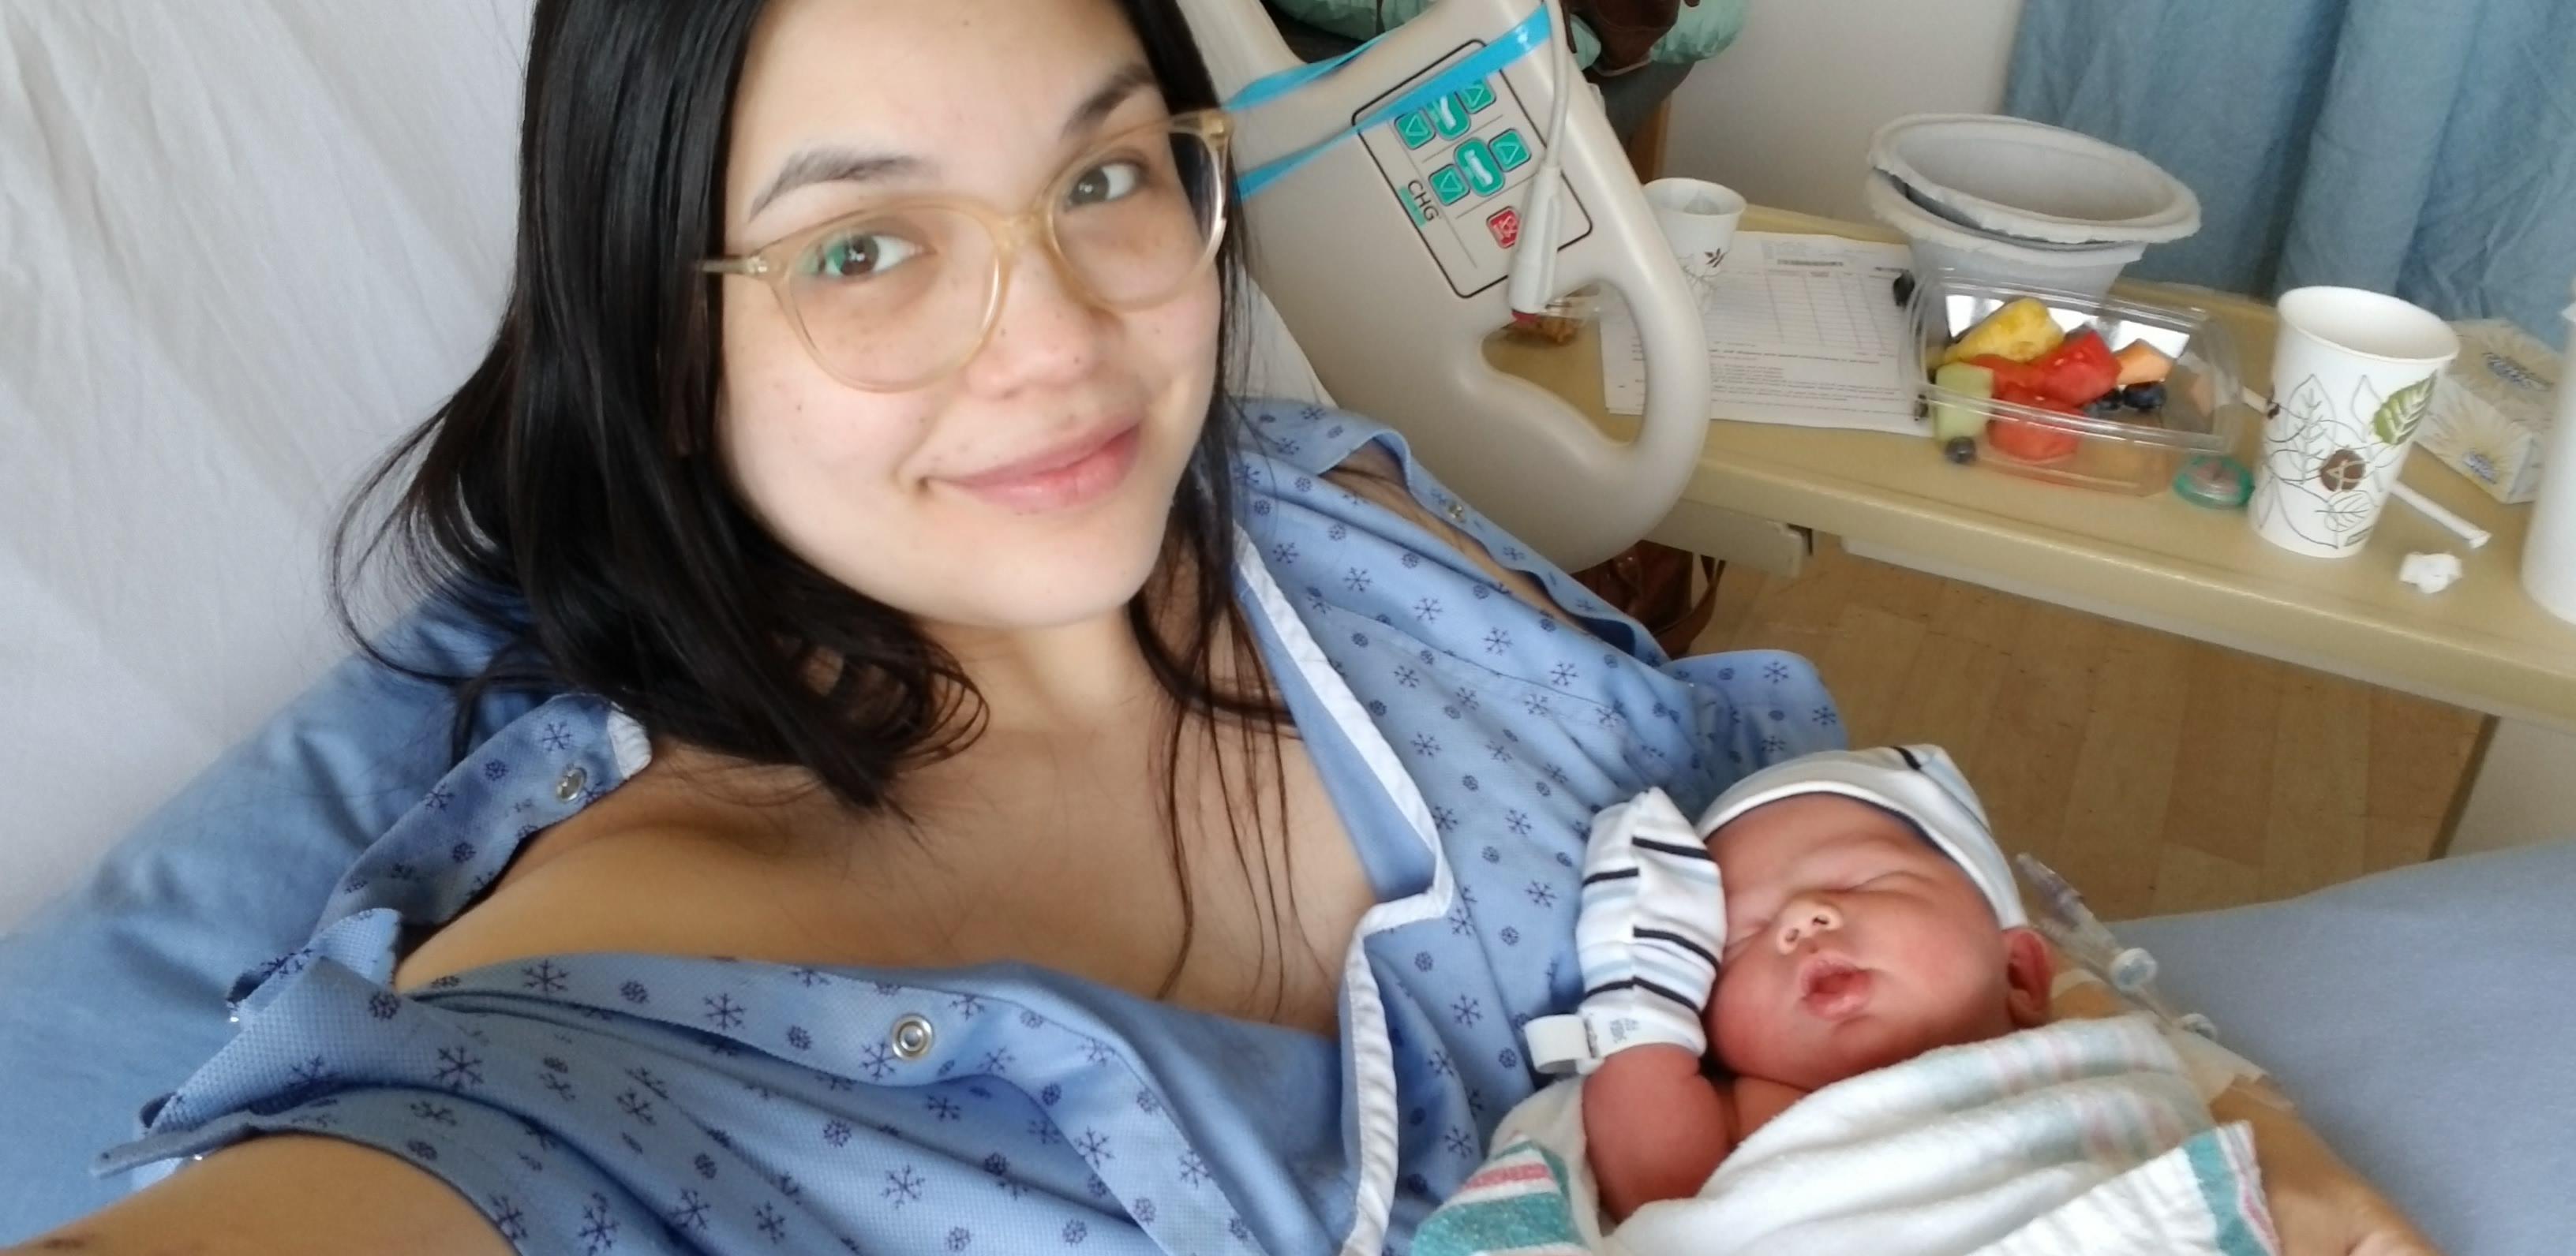 RJH holding her newborn son, Arthur.